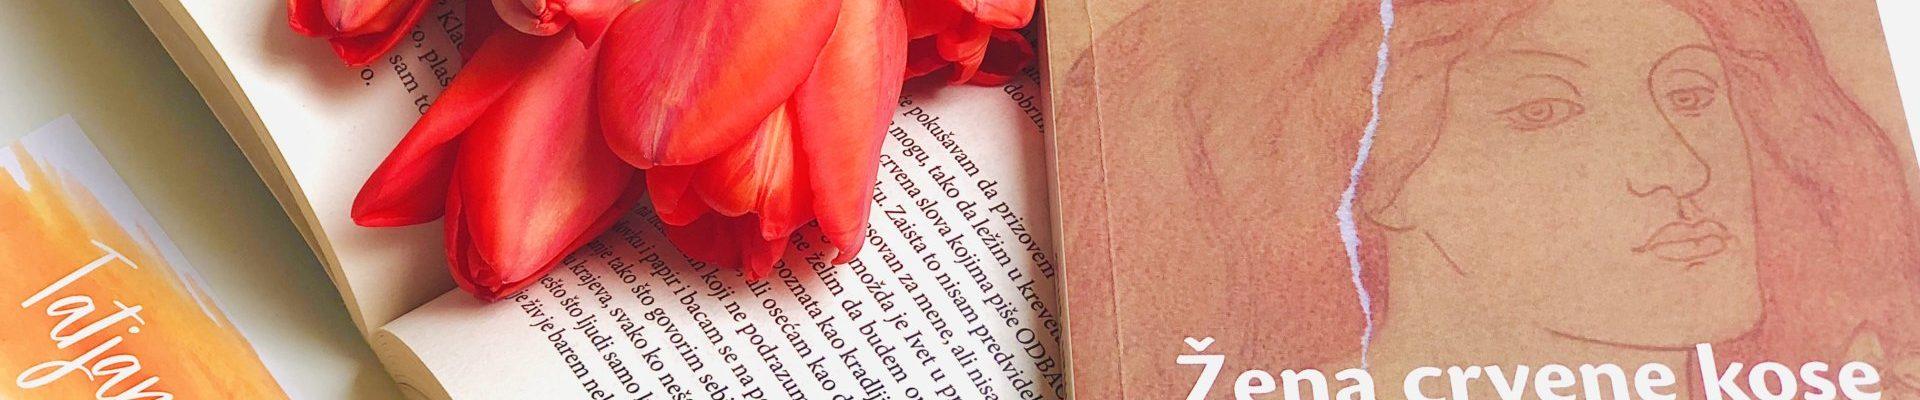 Orhan Pamuk: Žena crvene kose